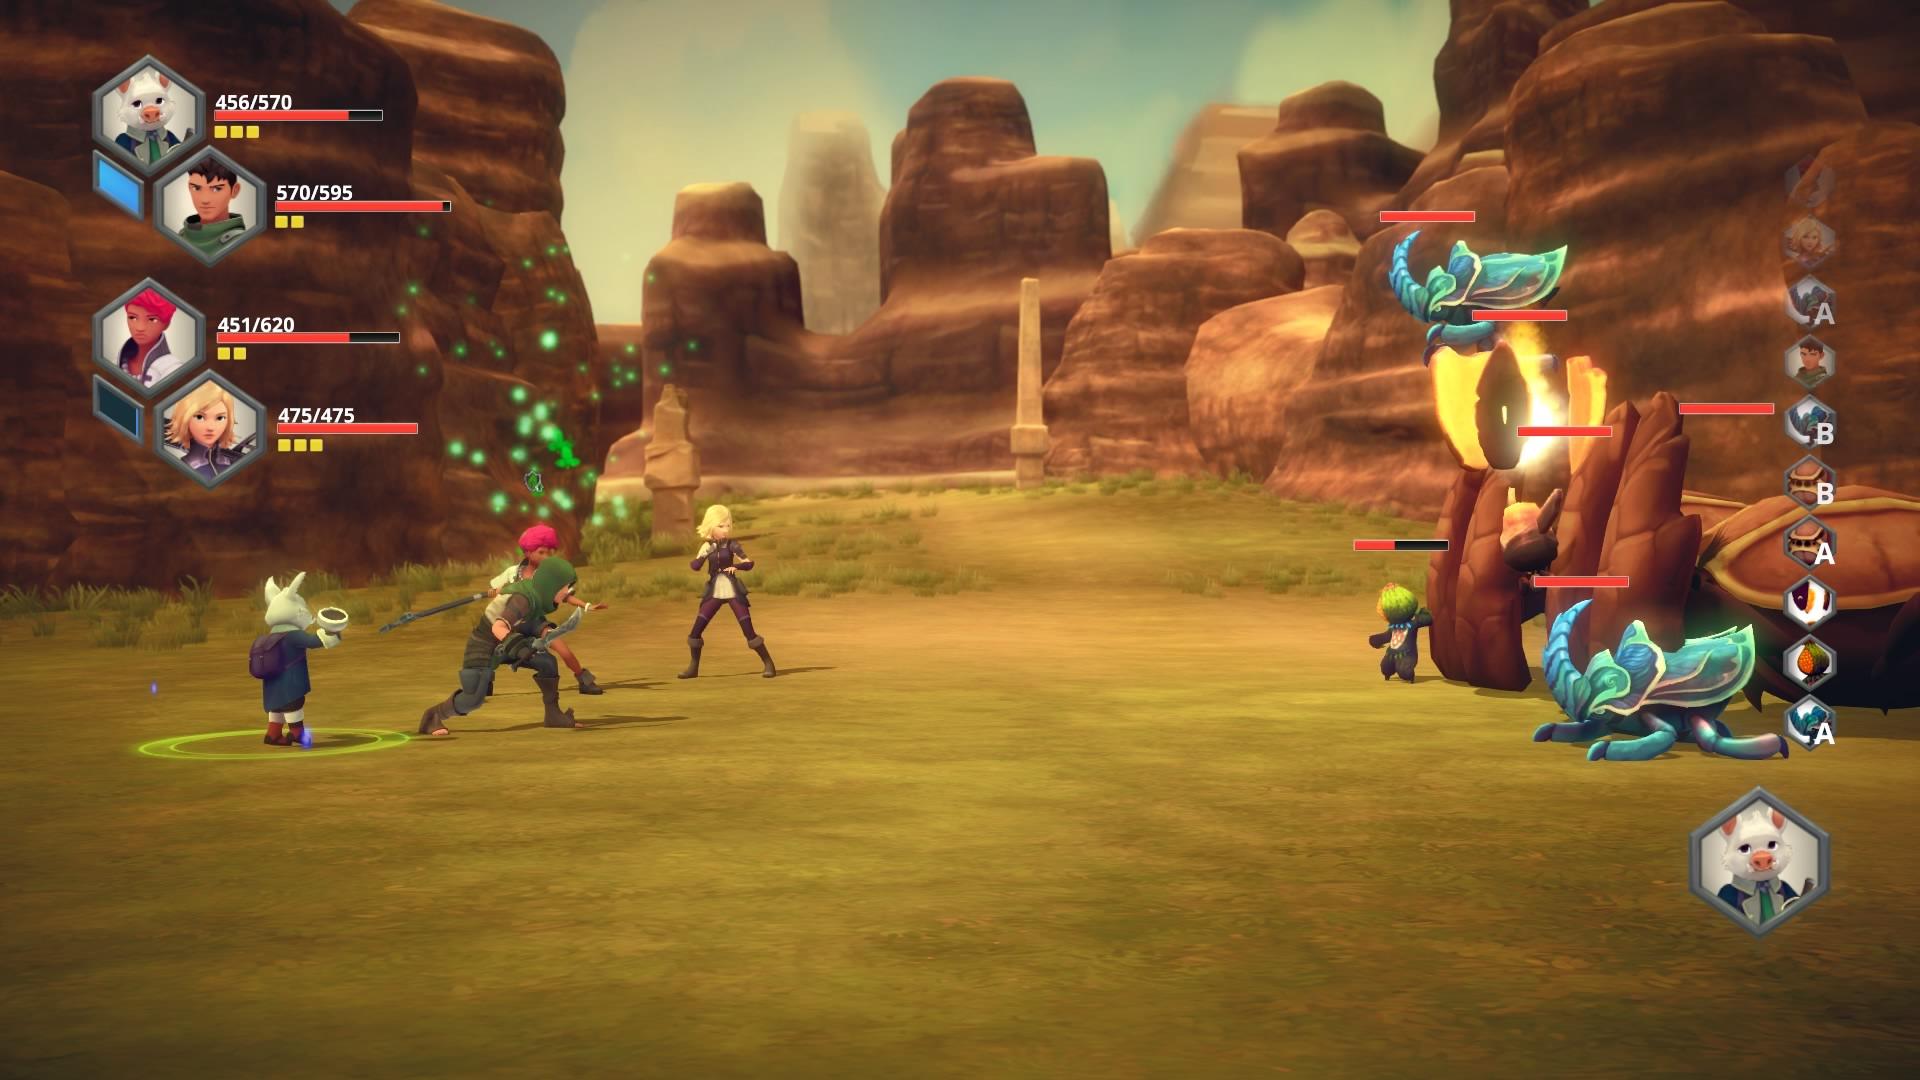 Earthlock: Festival of Magic for macOS gameplay